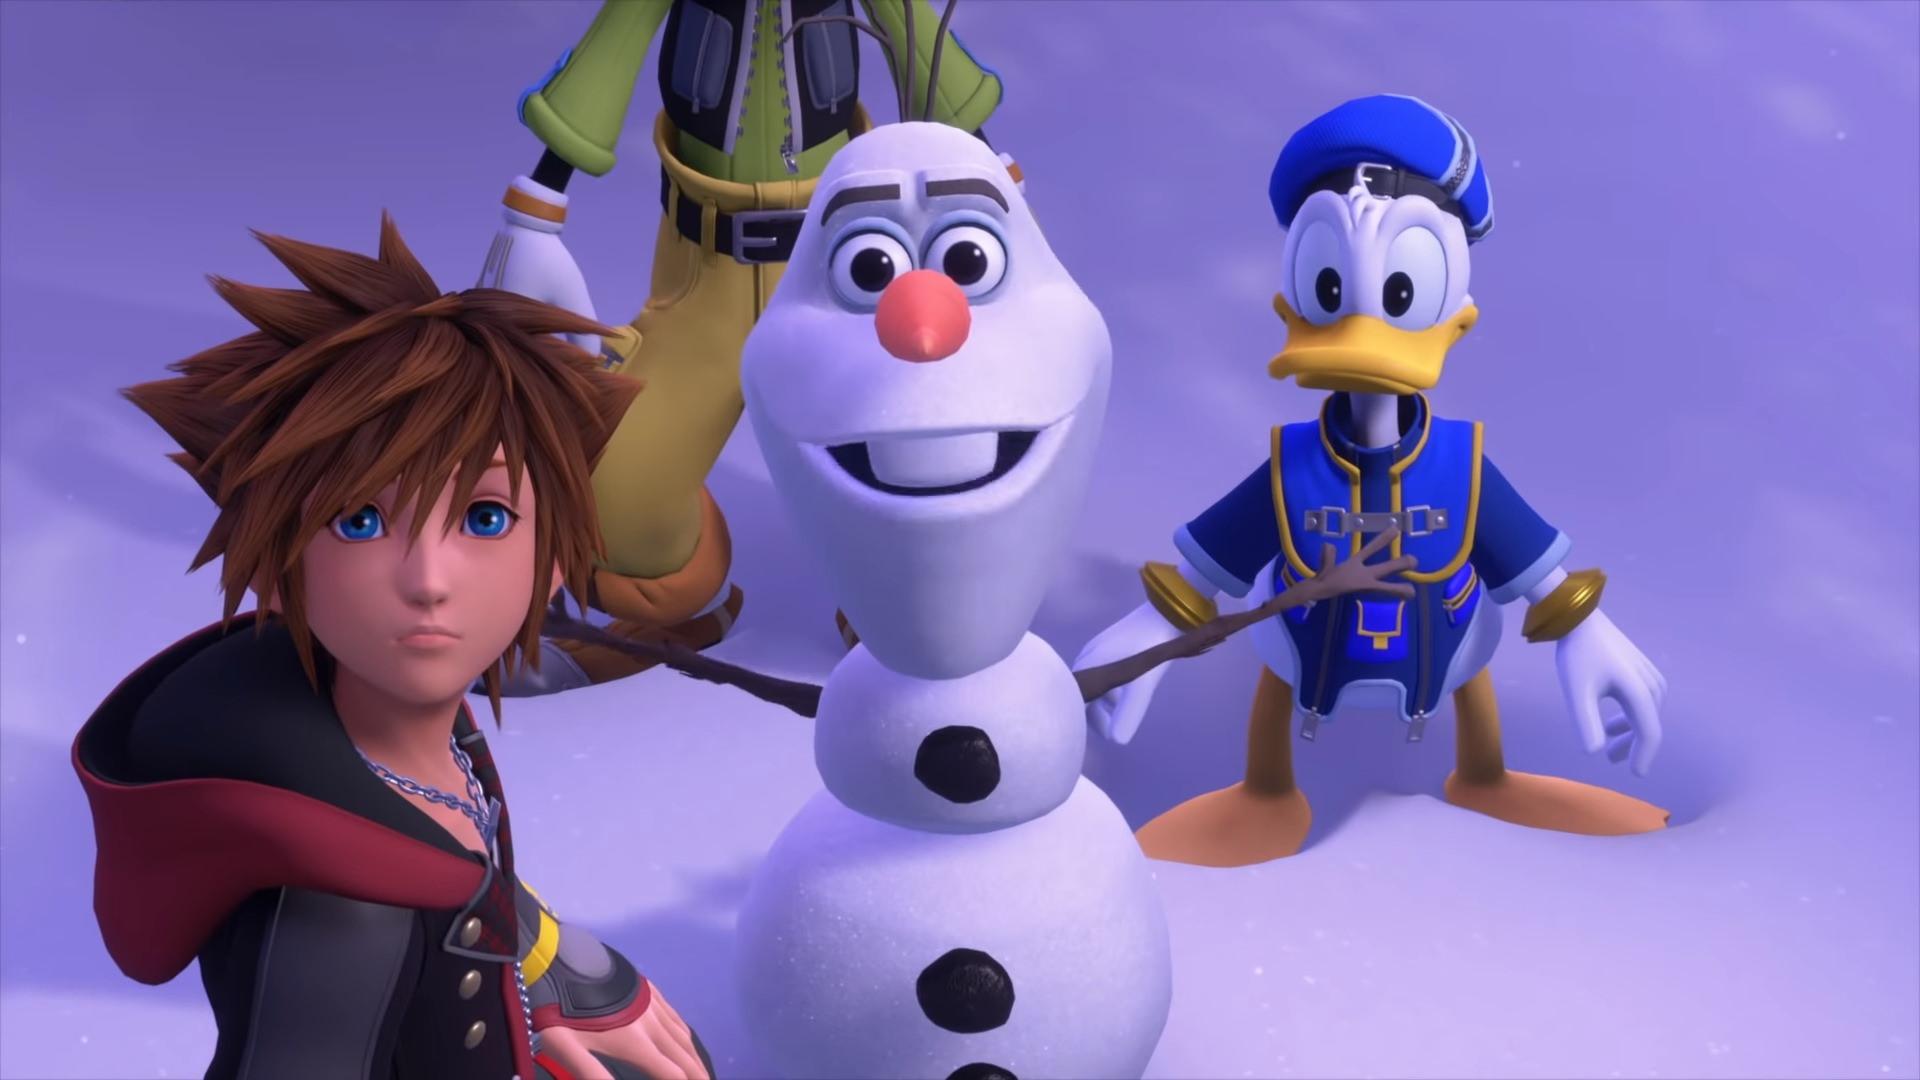 Sora, Donal et Dingo en compagnie d'Olaf (Reine des Neiges)